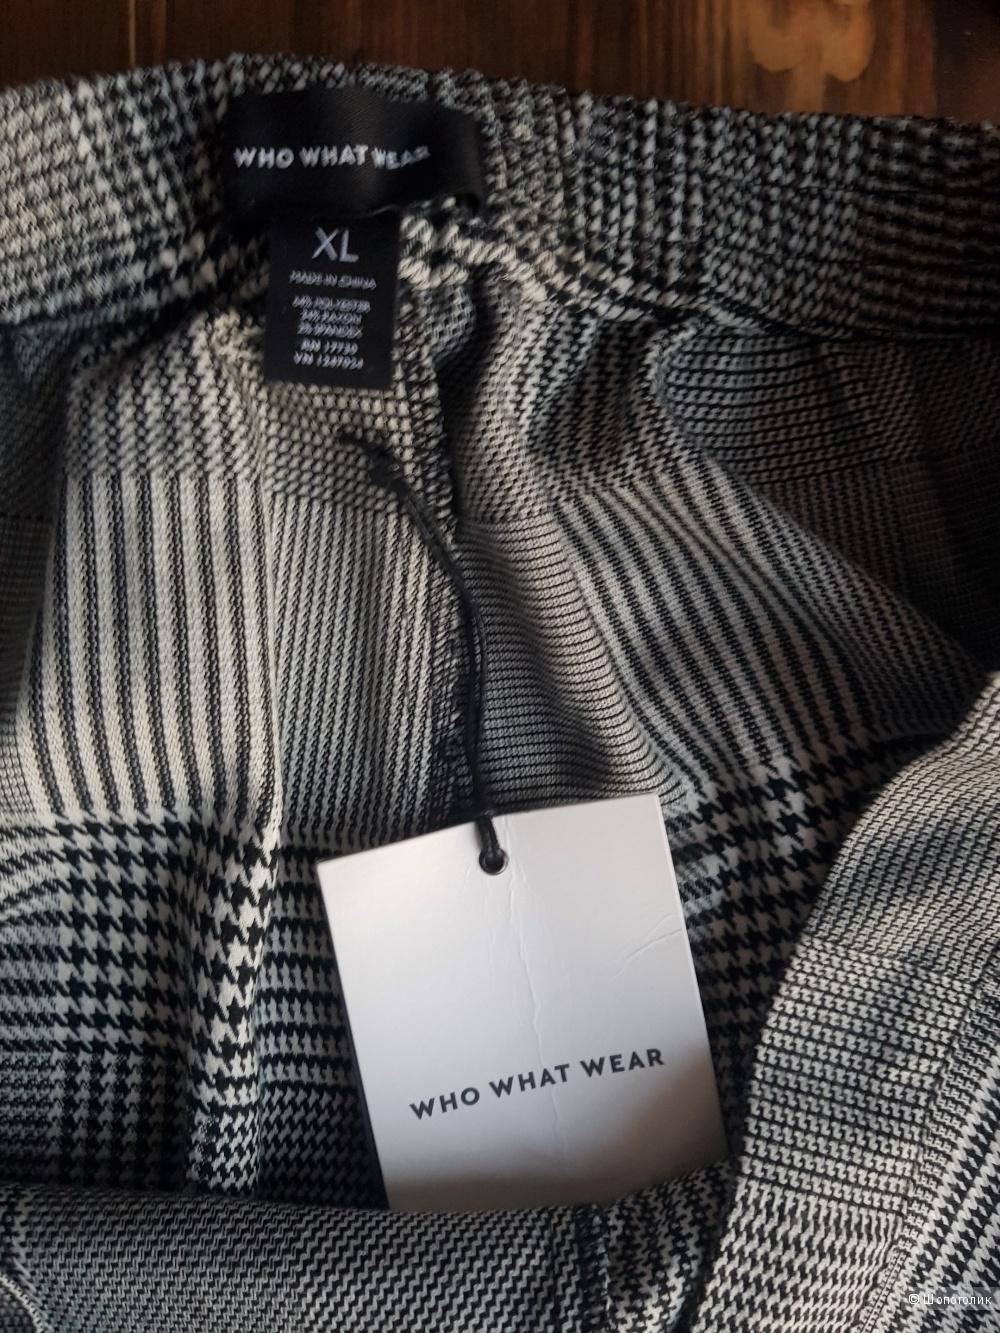 Брюки Who What Wear (XL)